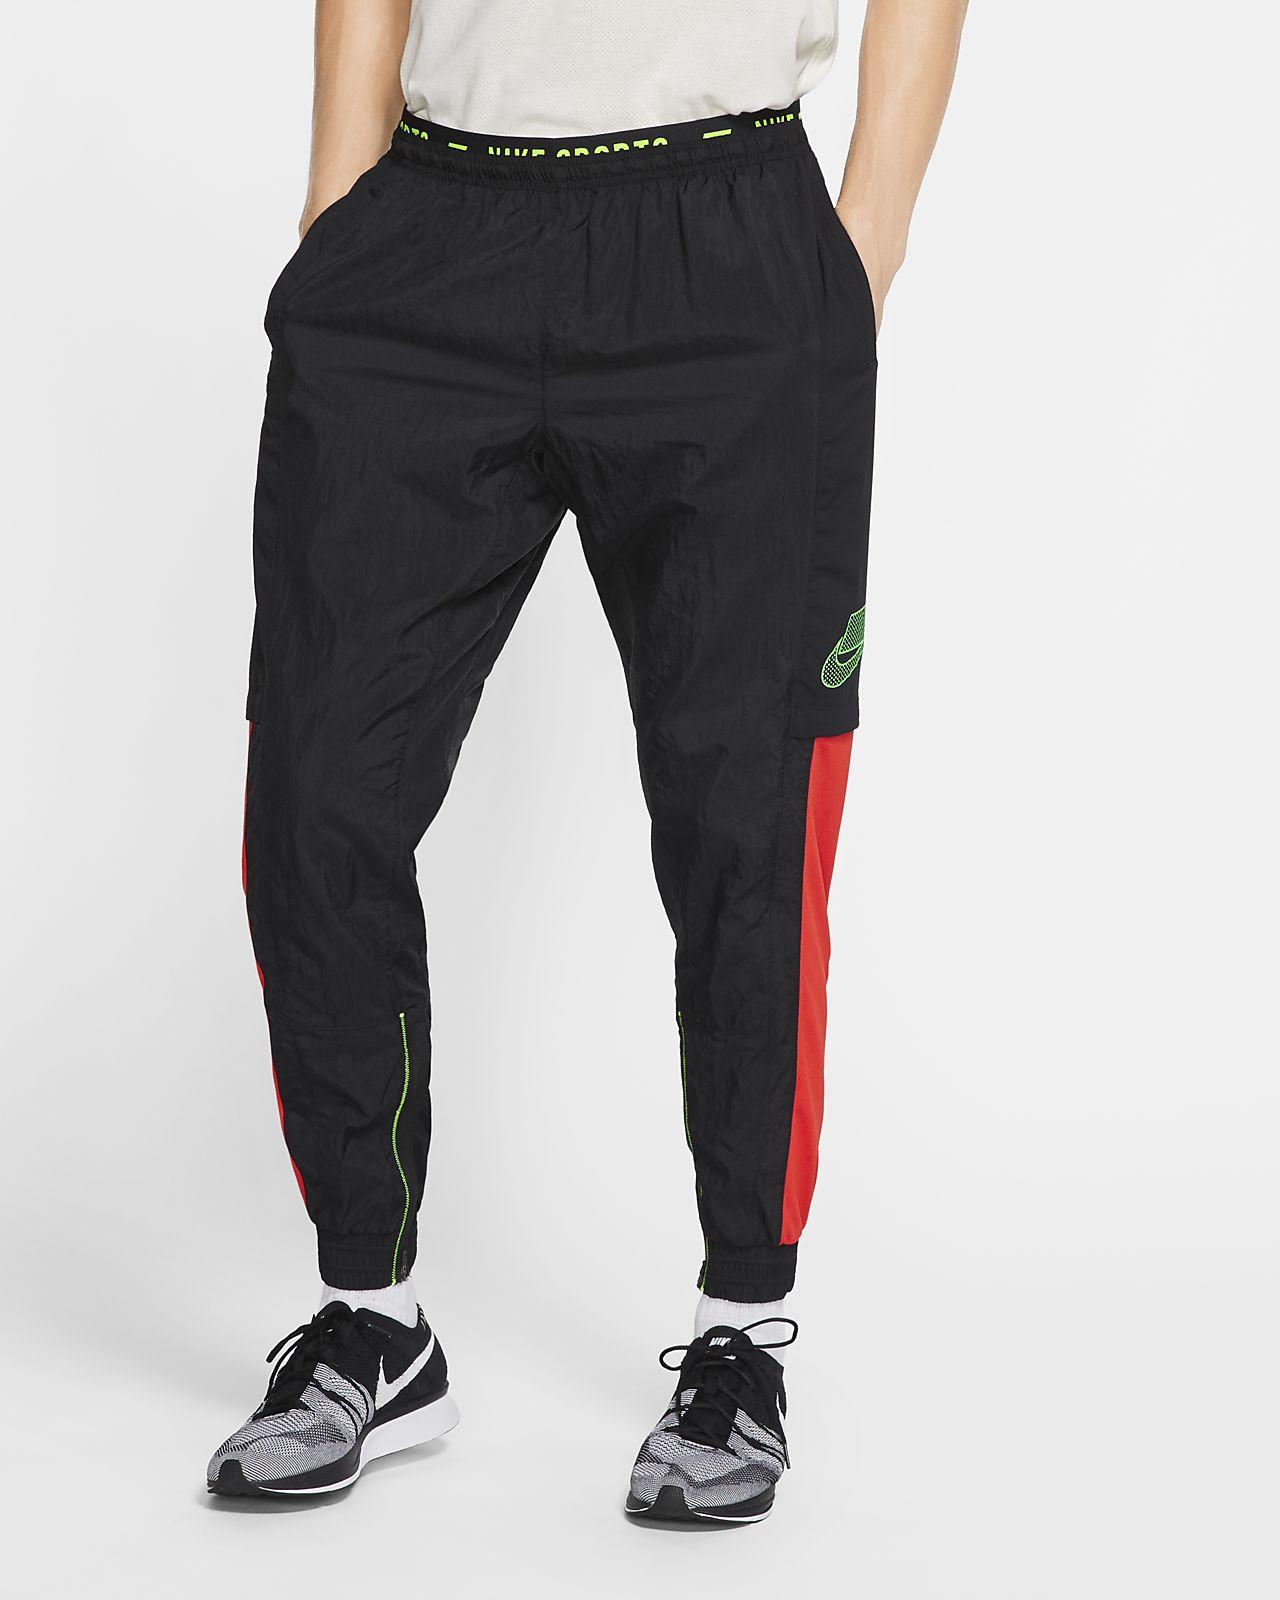 Pantaloni da training Nike Dri-FIT Flex Sport Clash - Uomo